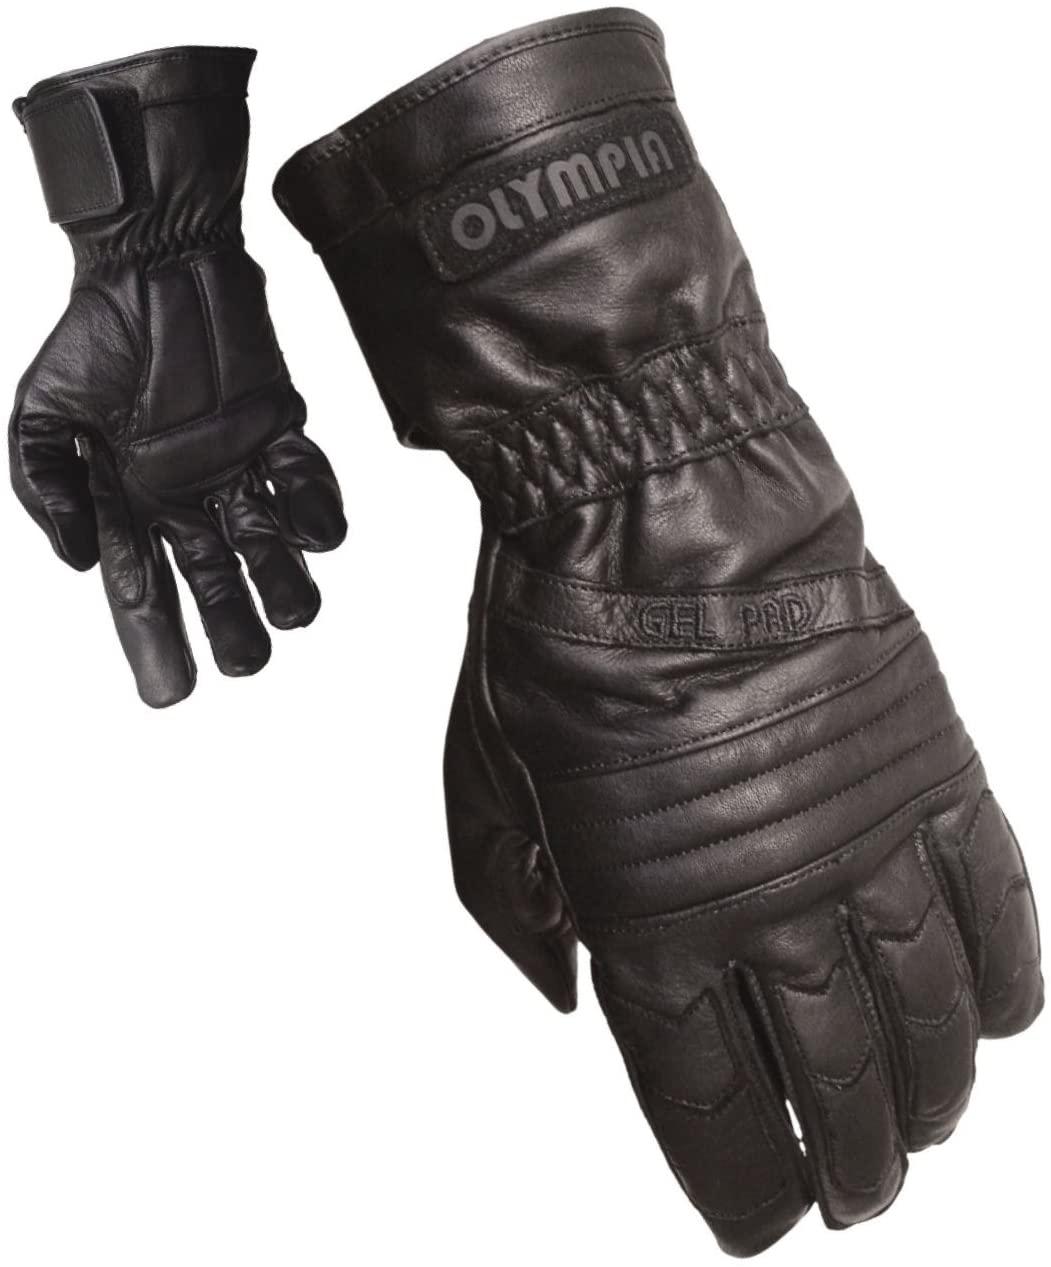 Olympia Sports Mens Gel Sport Gloves (Black, X-Large) - 410 XL